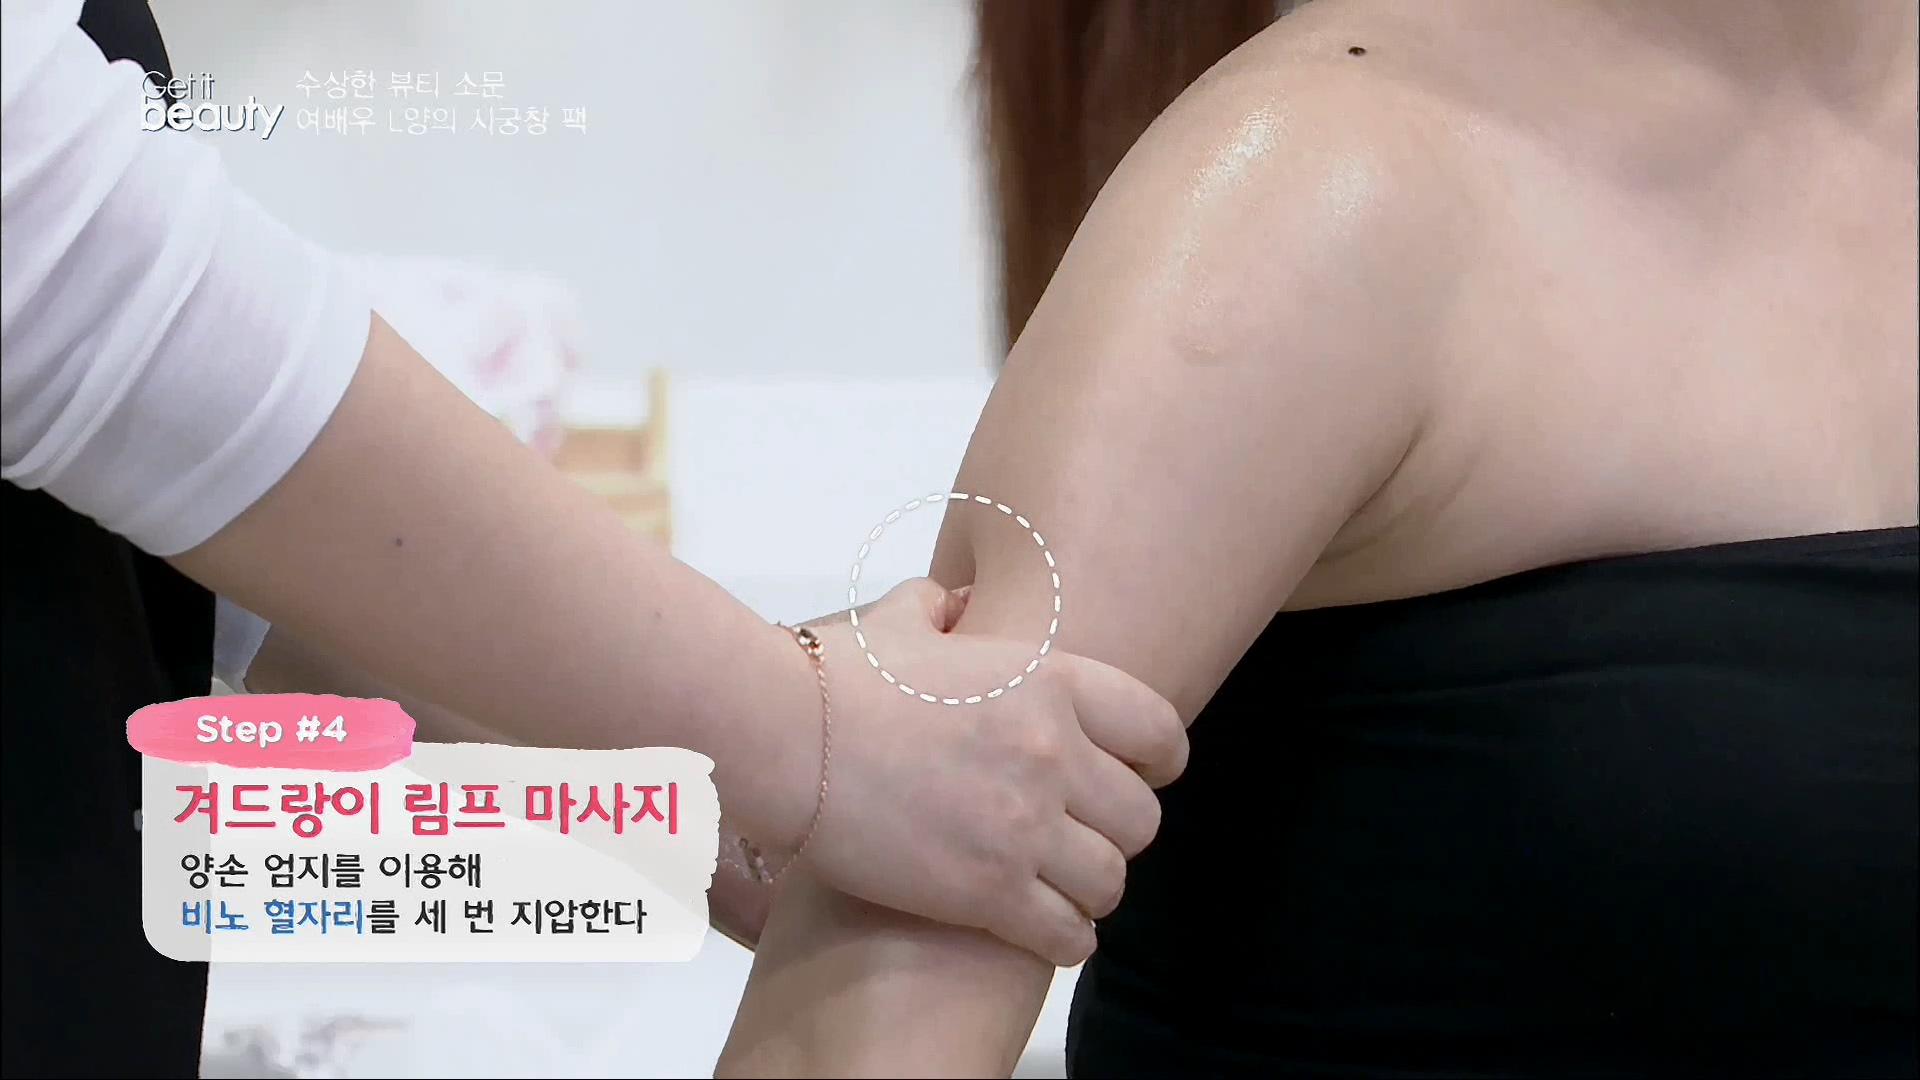 Step#4.겨드랑이 림프 마사지 양손 엄지를 이용해 비노 혈자리를 세 번 지압한다.